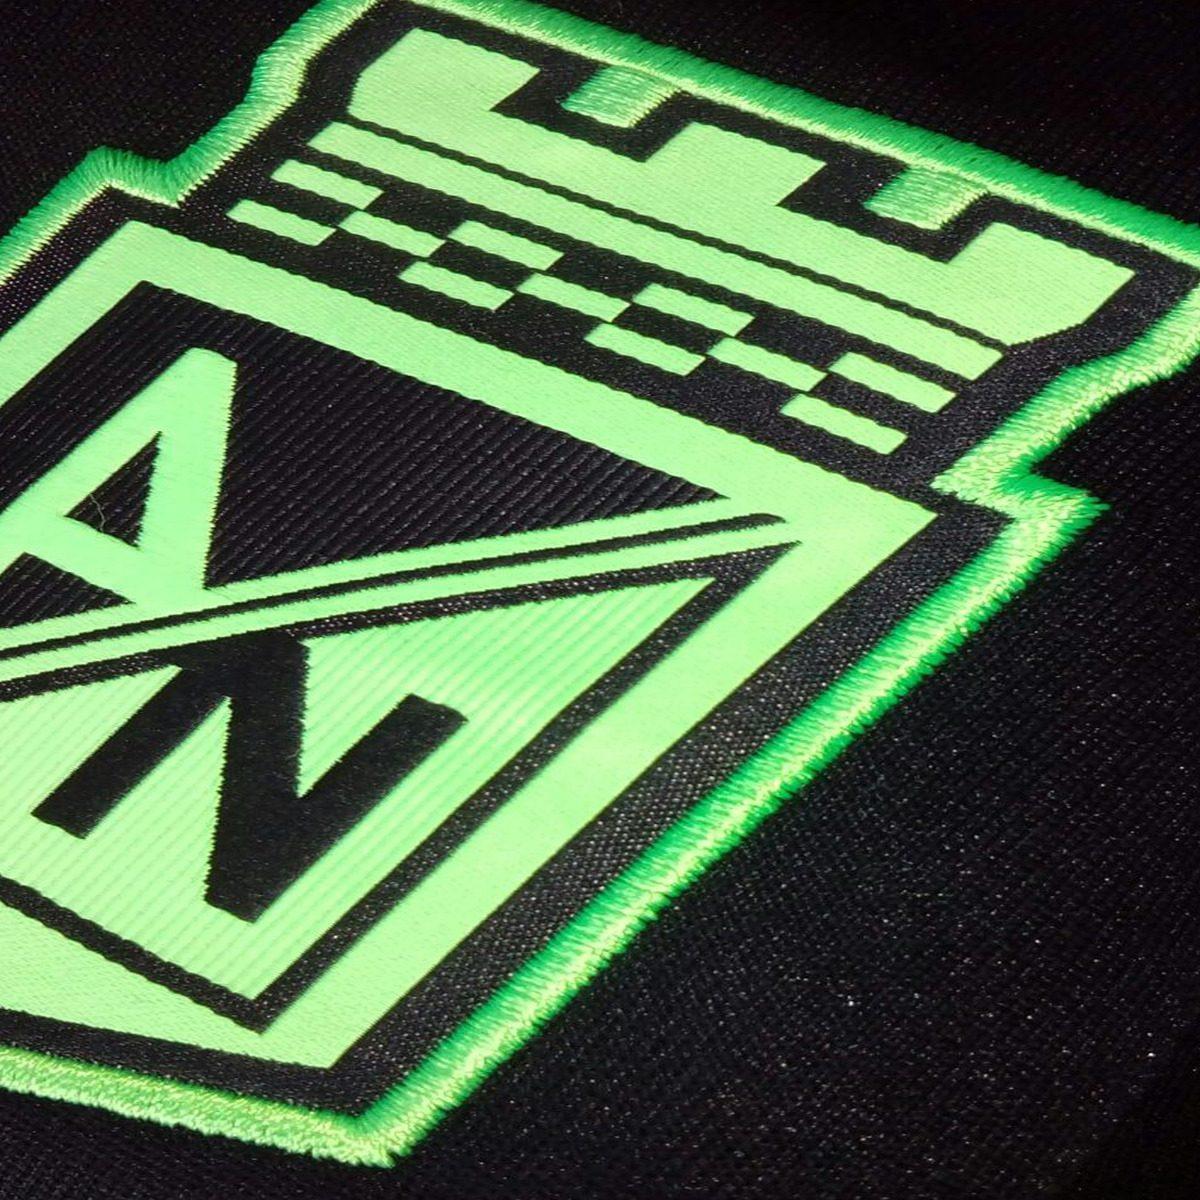 Chaqueta Nike Nacional Authentic Para Hombre -   79.900 en Mercado Libre 5dd922feb61